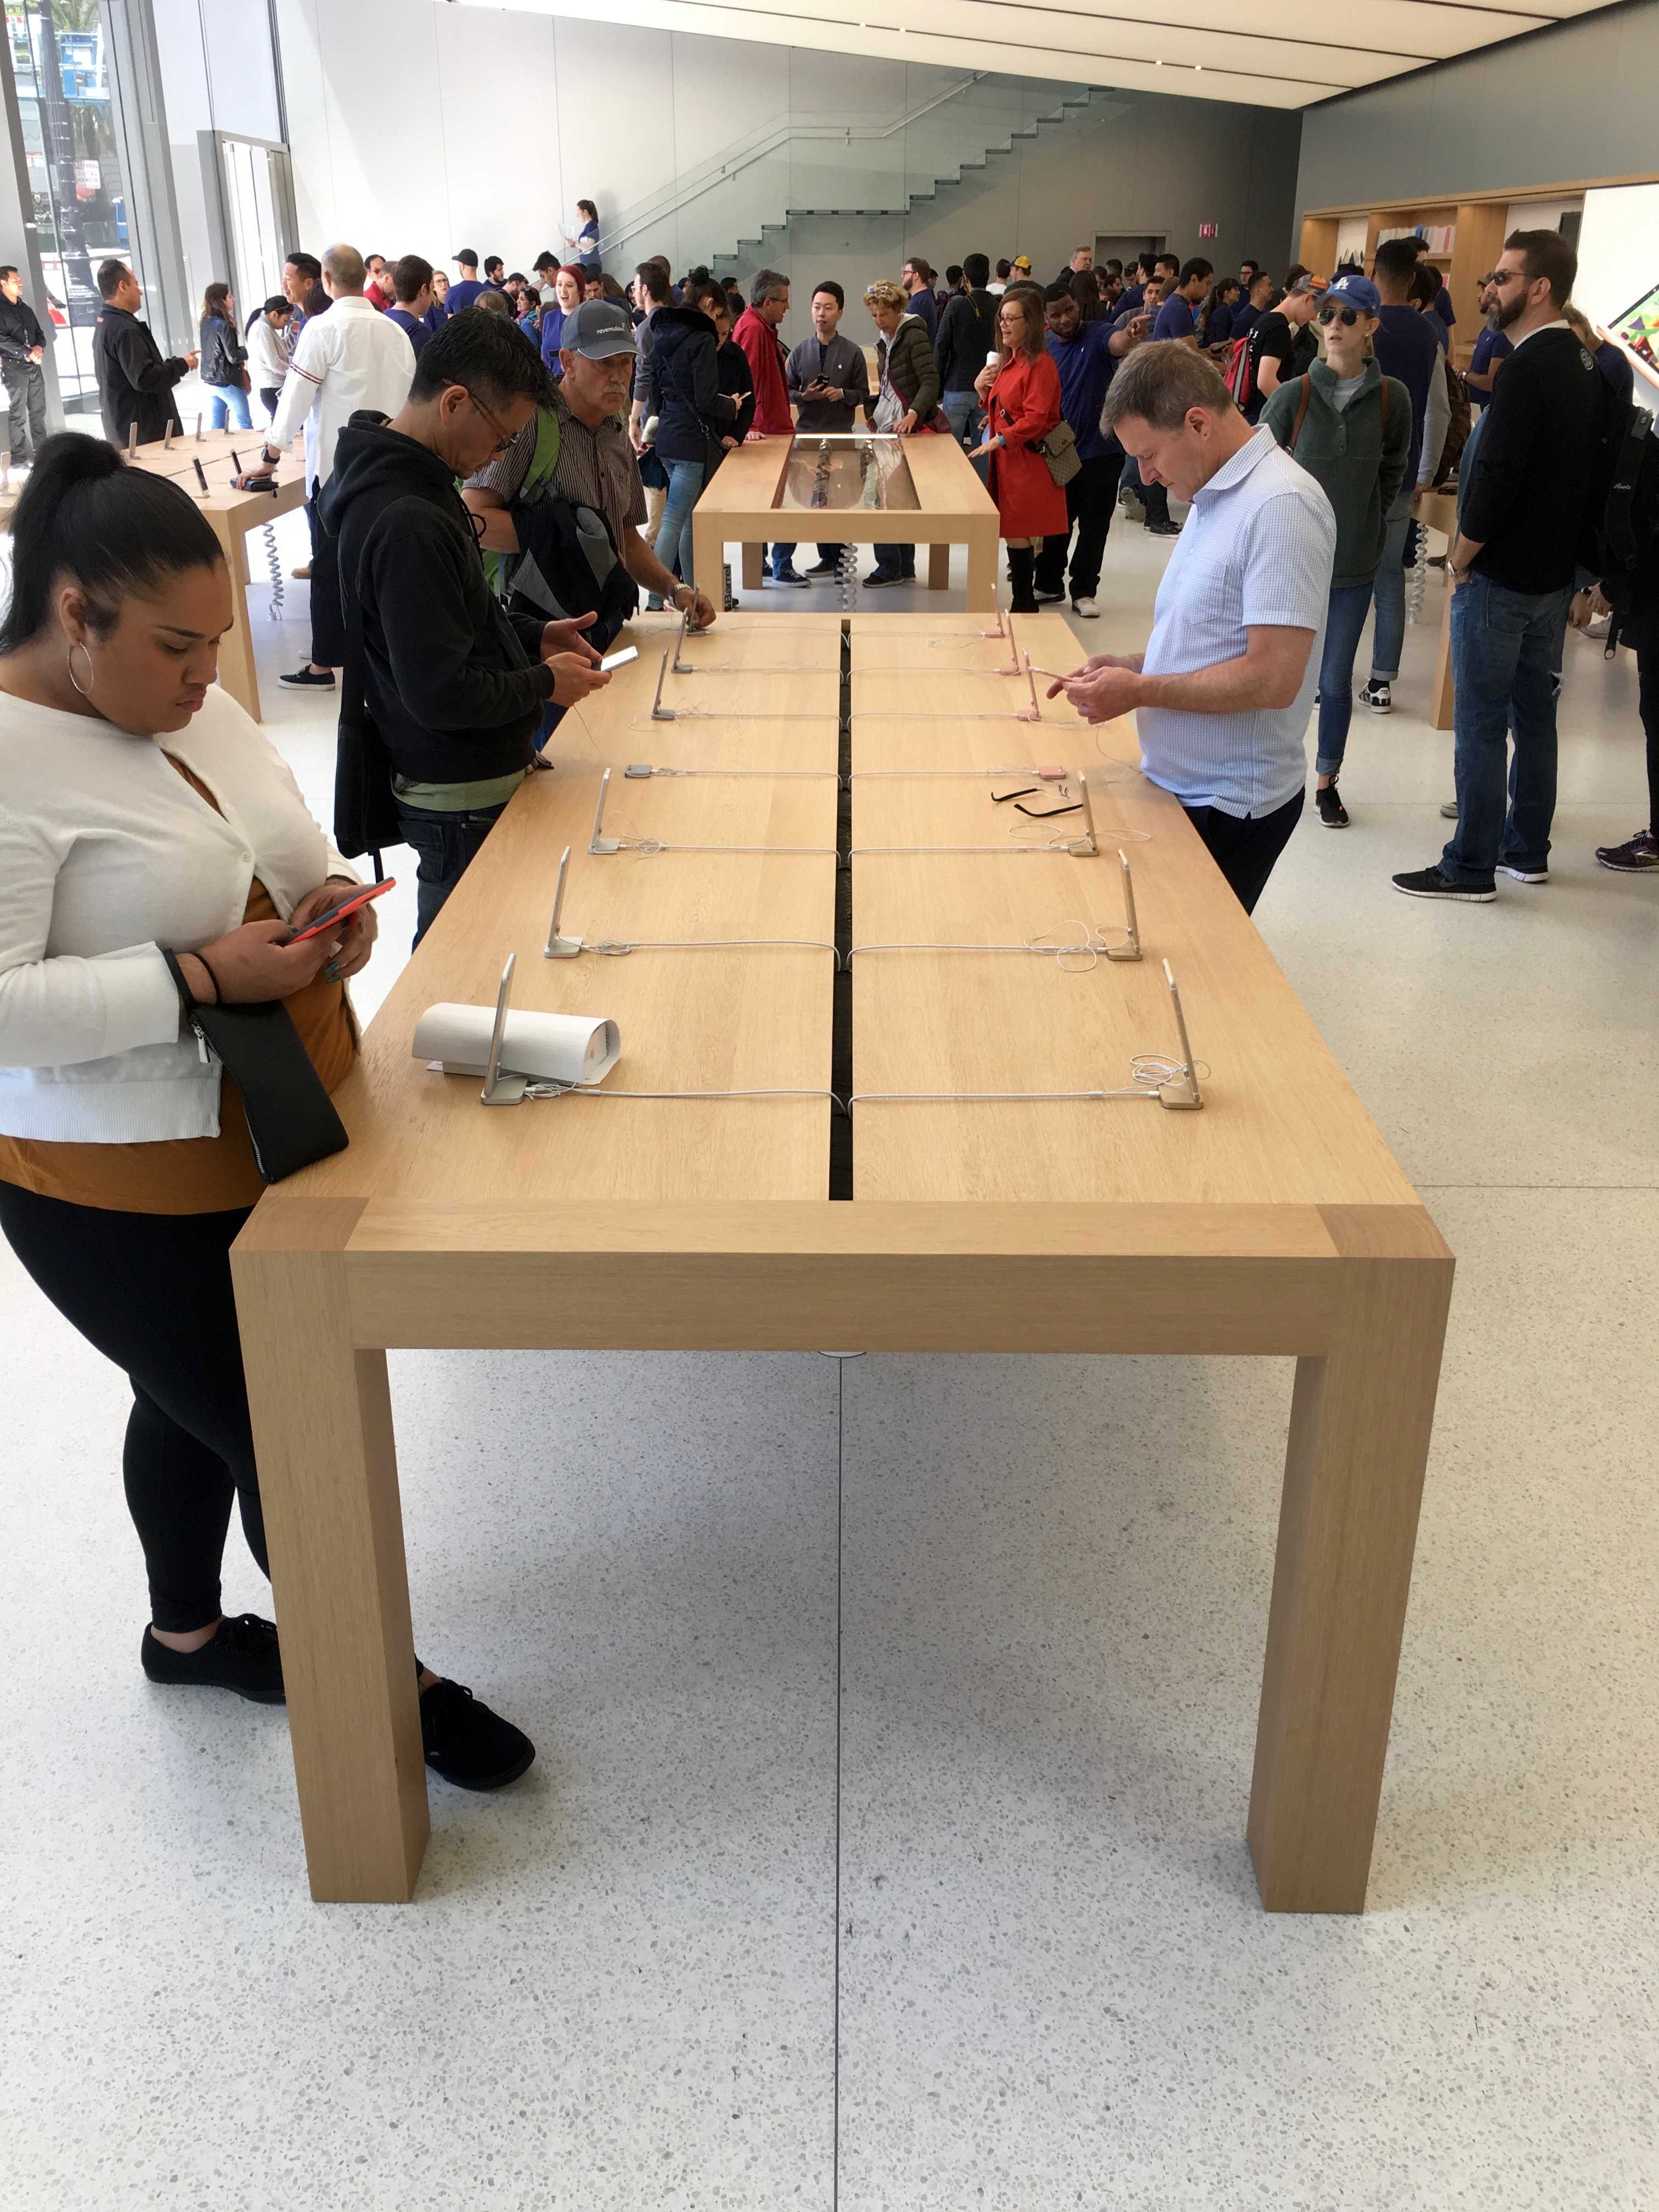 Apple_Store_Union_Square_lines_1-1